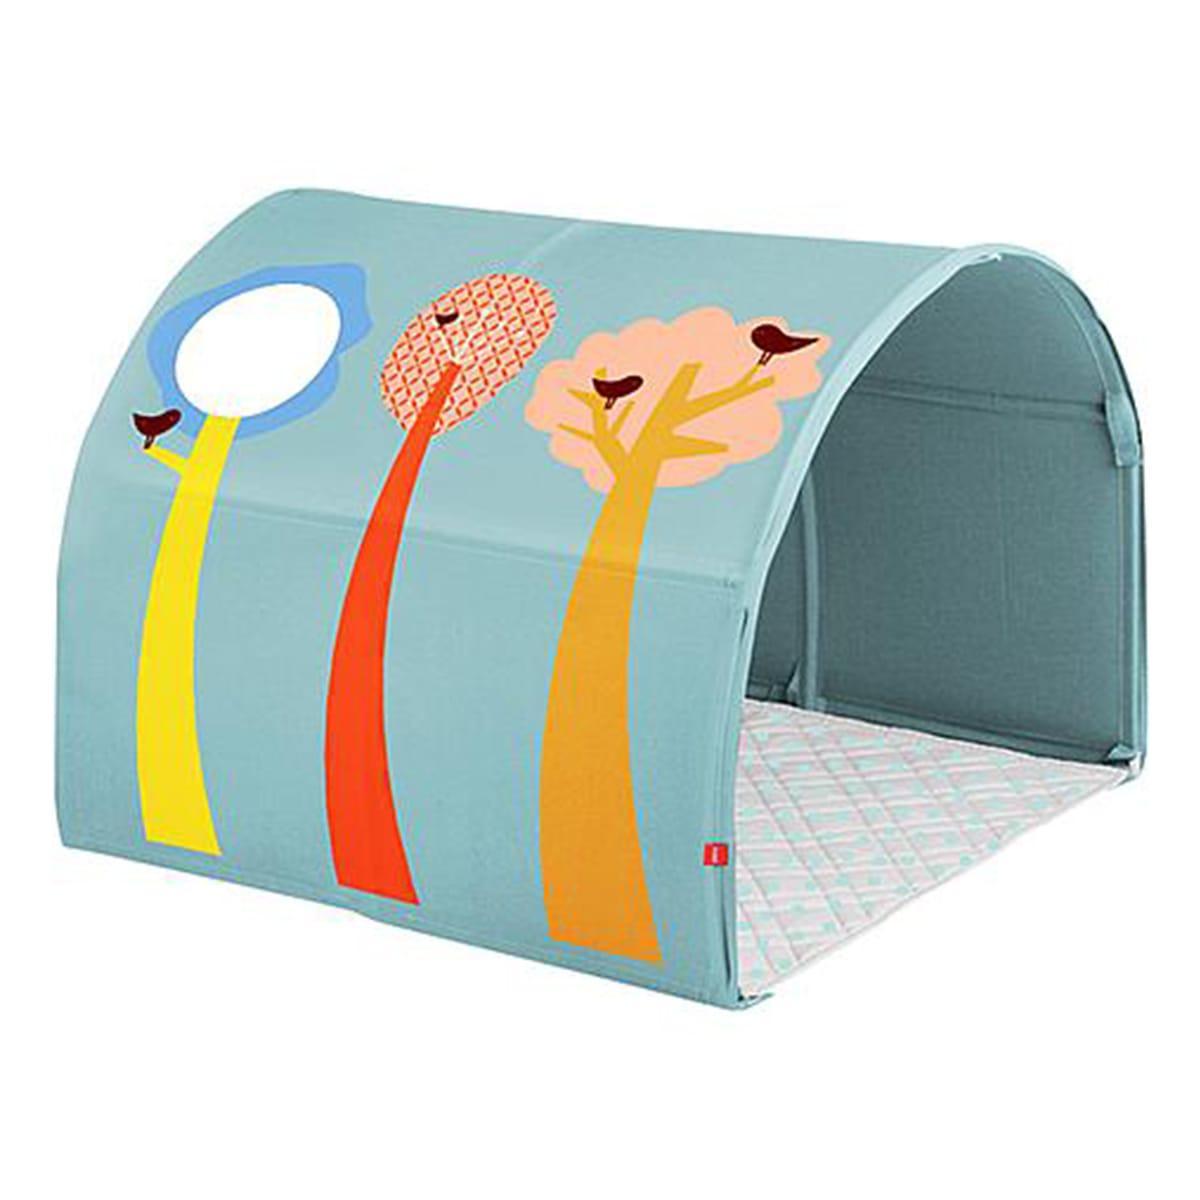 Cabane tunnel jeu FOREST Flexa